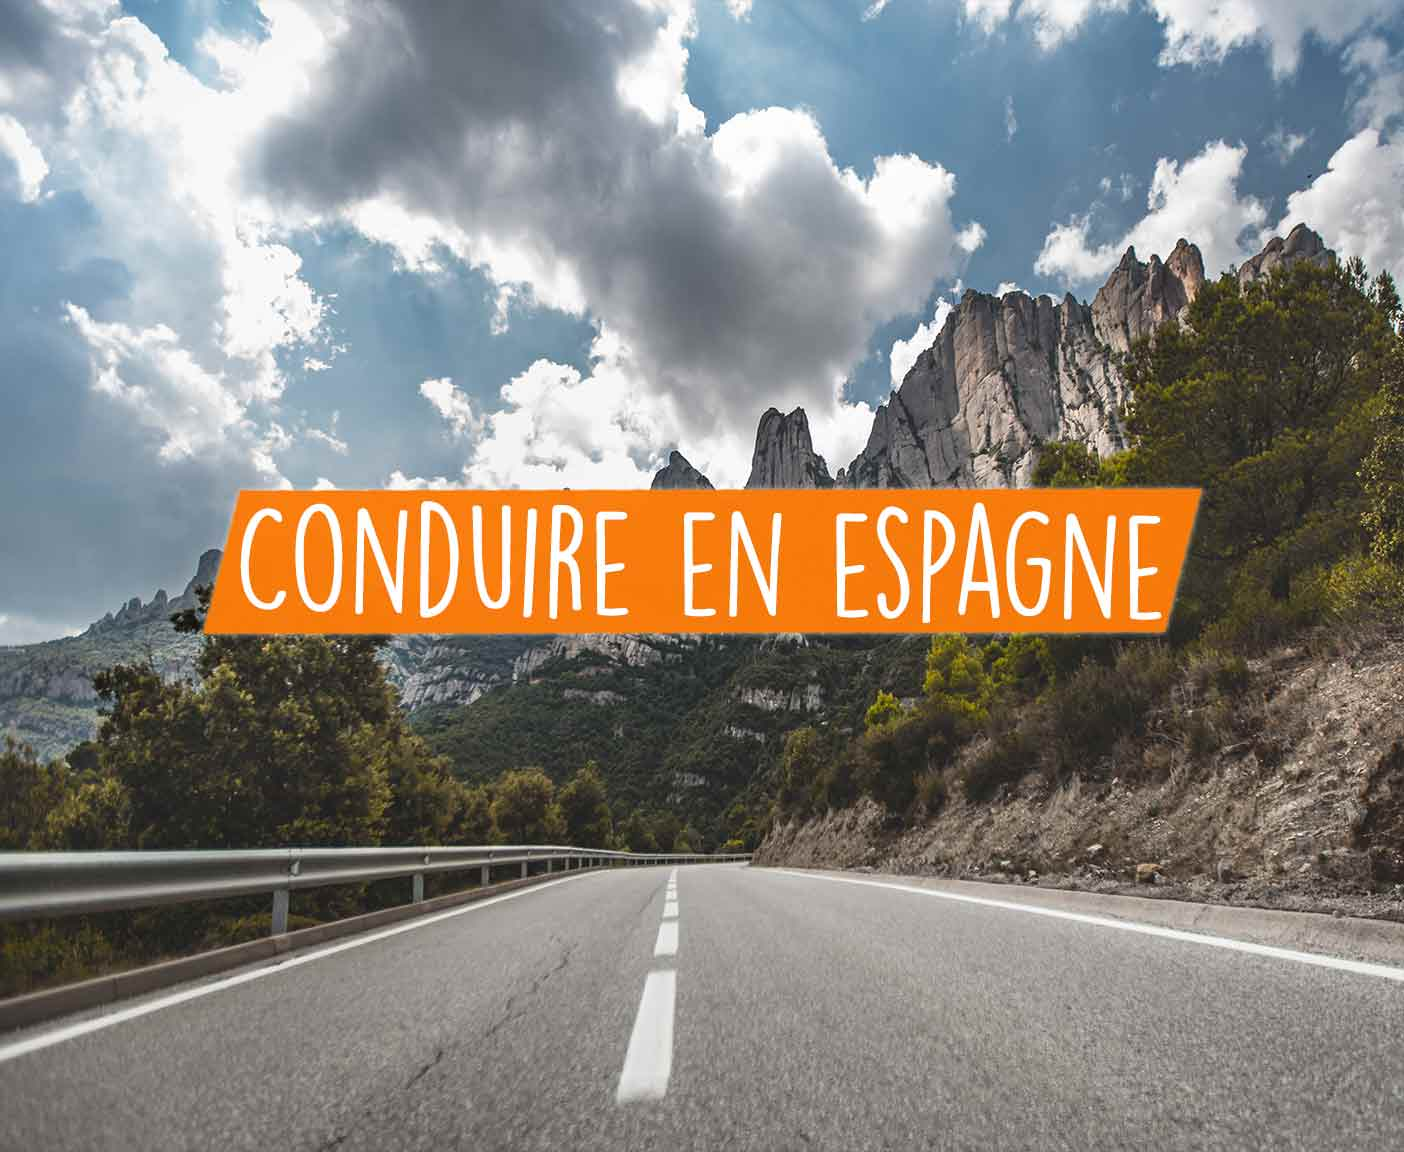 espagne-conduite-regles-roadtrip-vanlife-vacances